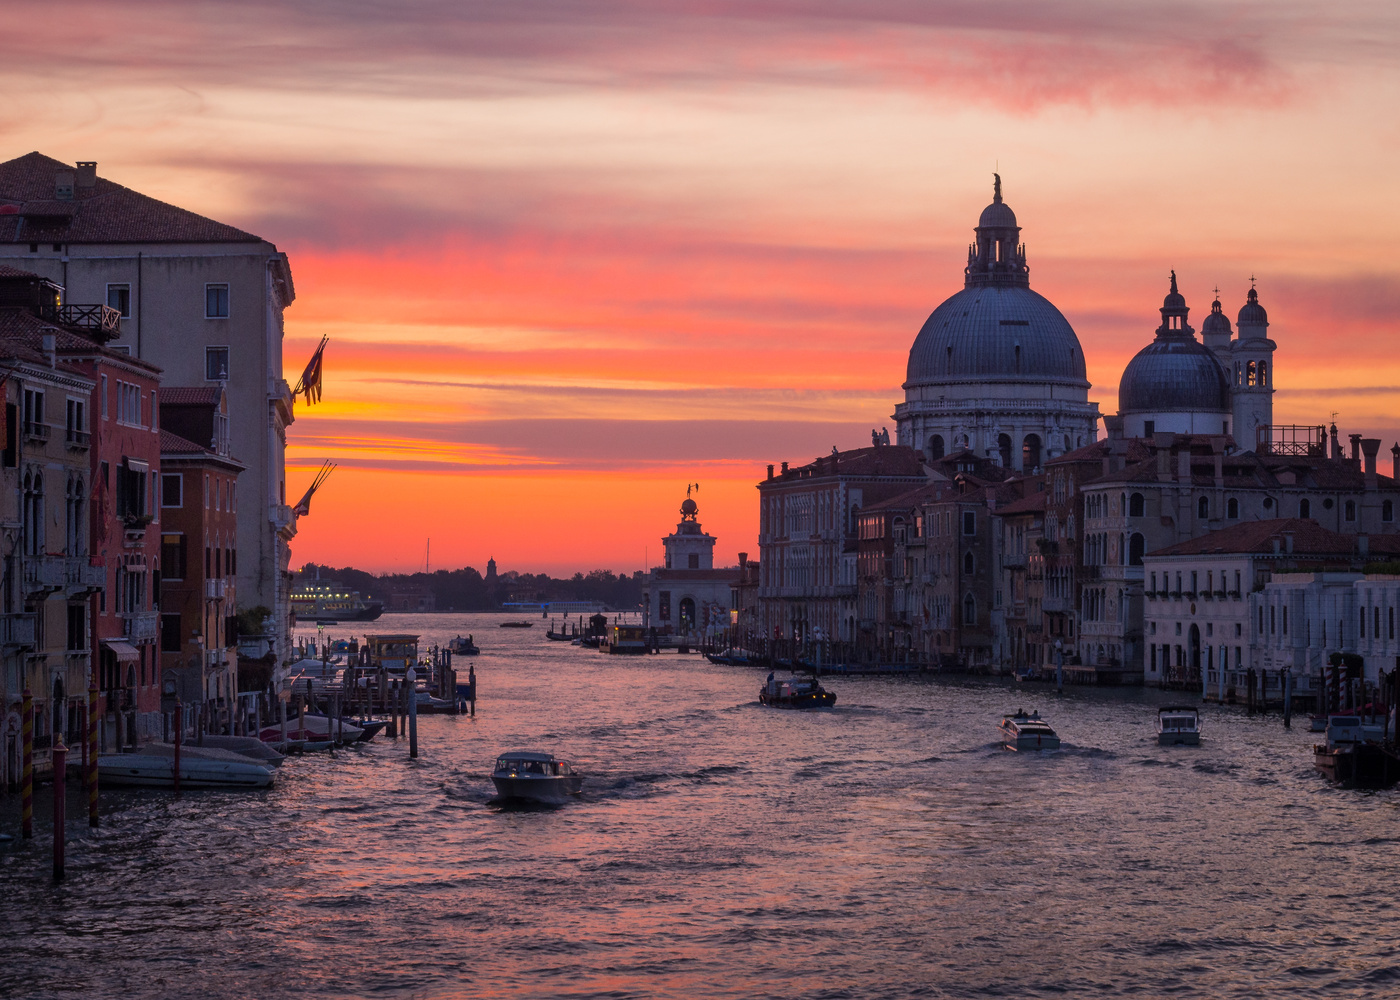 Venice morning by Piotr Pogonowski